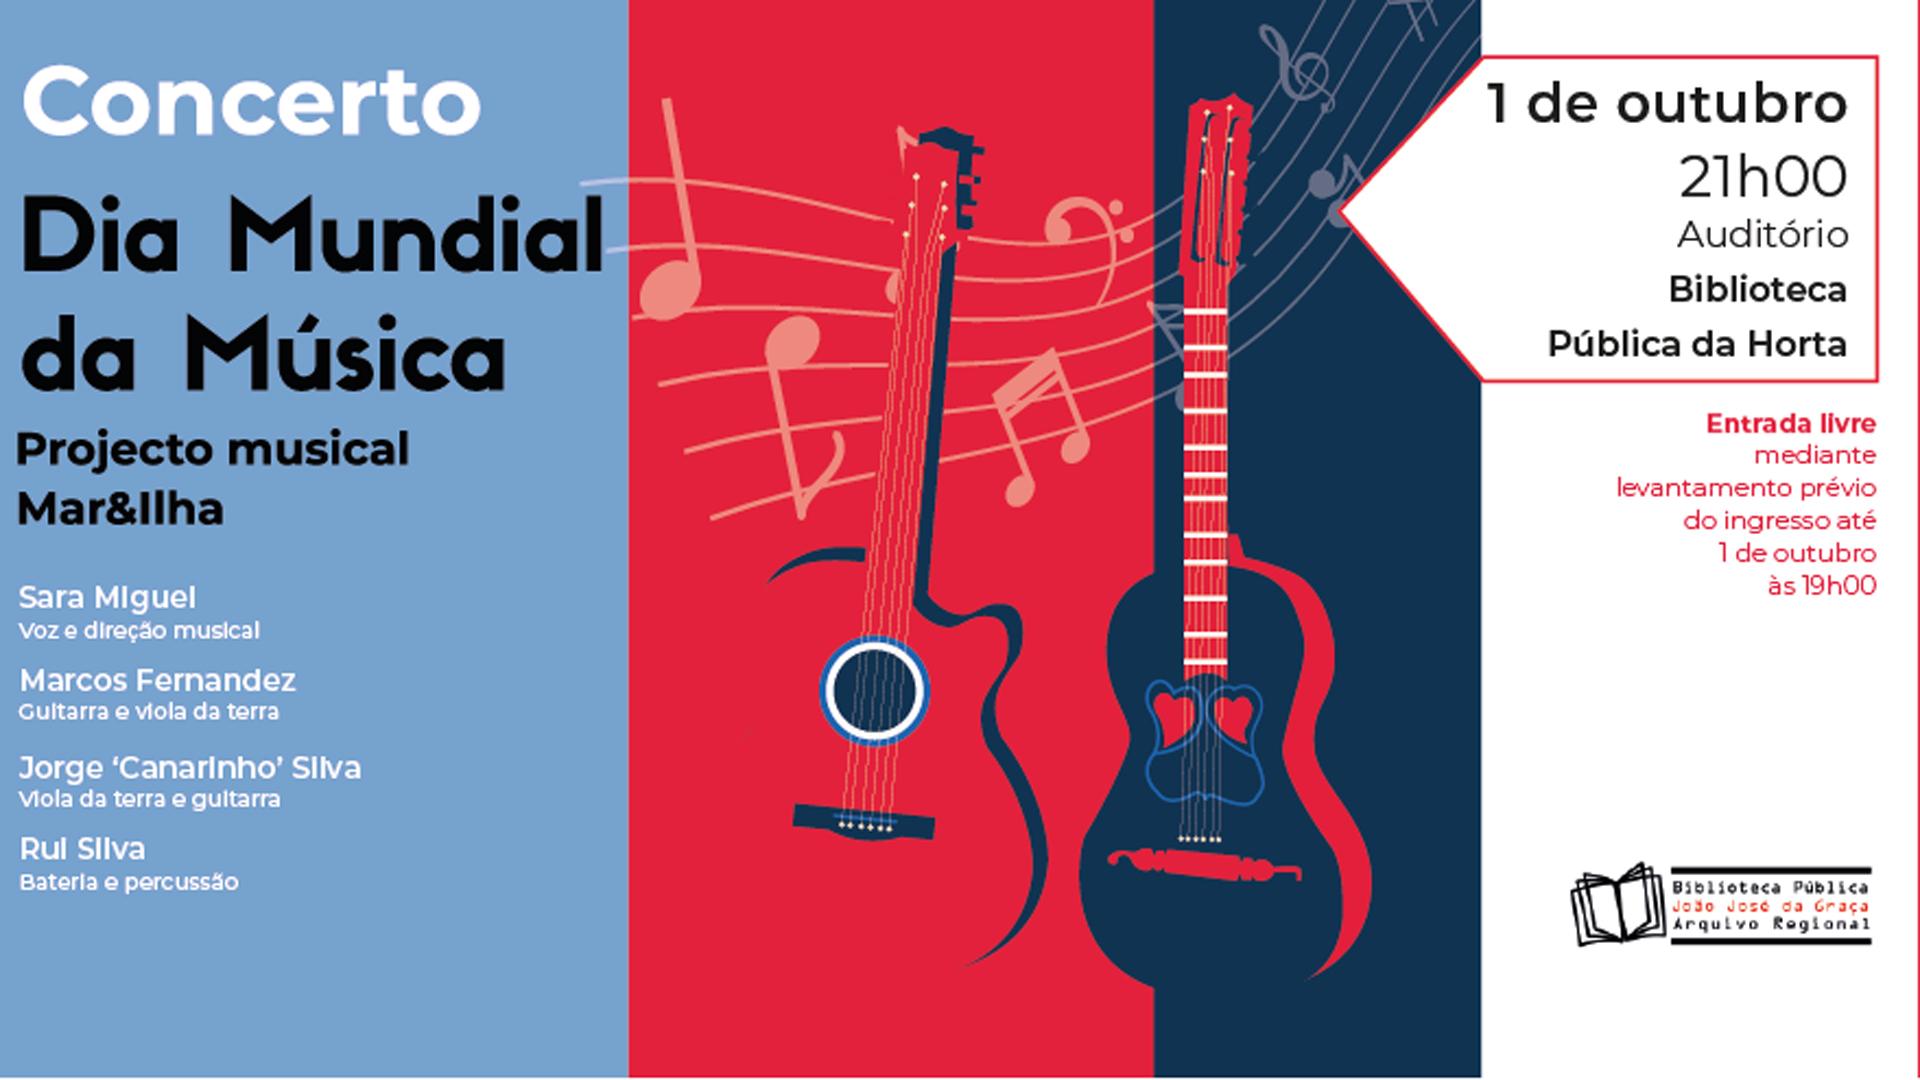 Projeto musical Mar&Ilha na Biblioteca Pública da Horta - CARTAZ